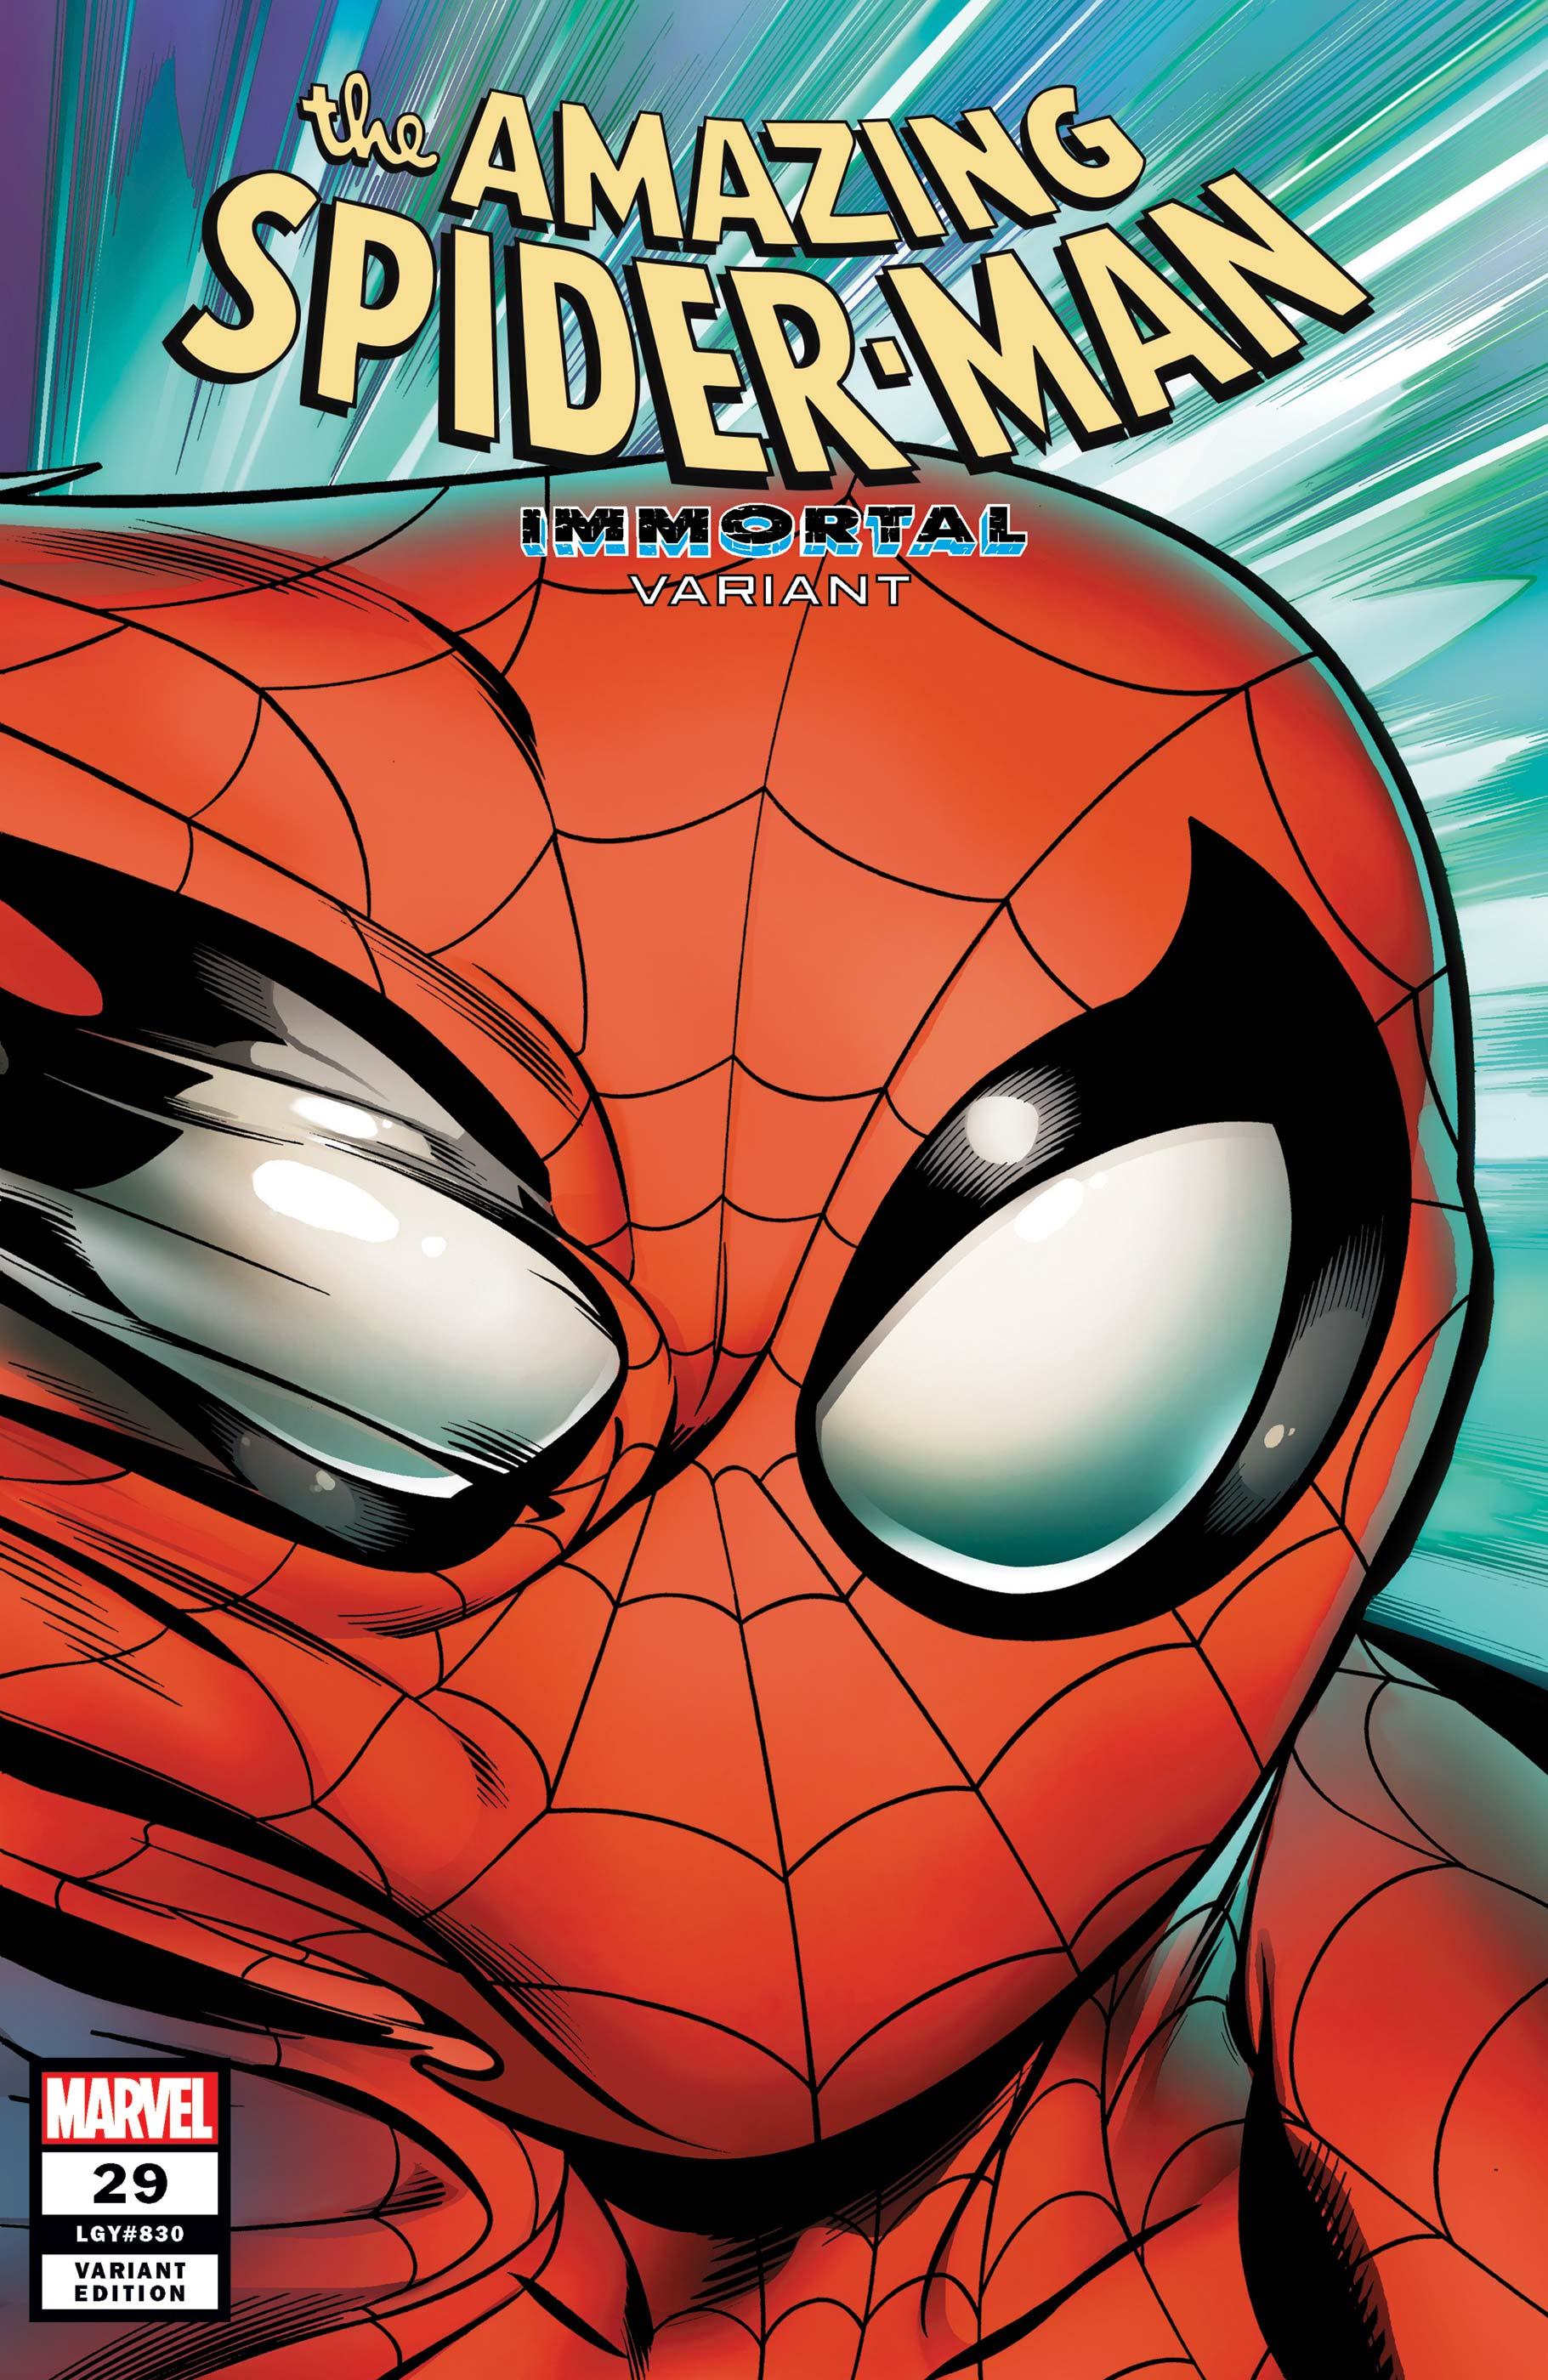 The Amazing Spider-Man (2018) #29 (Variant)